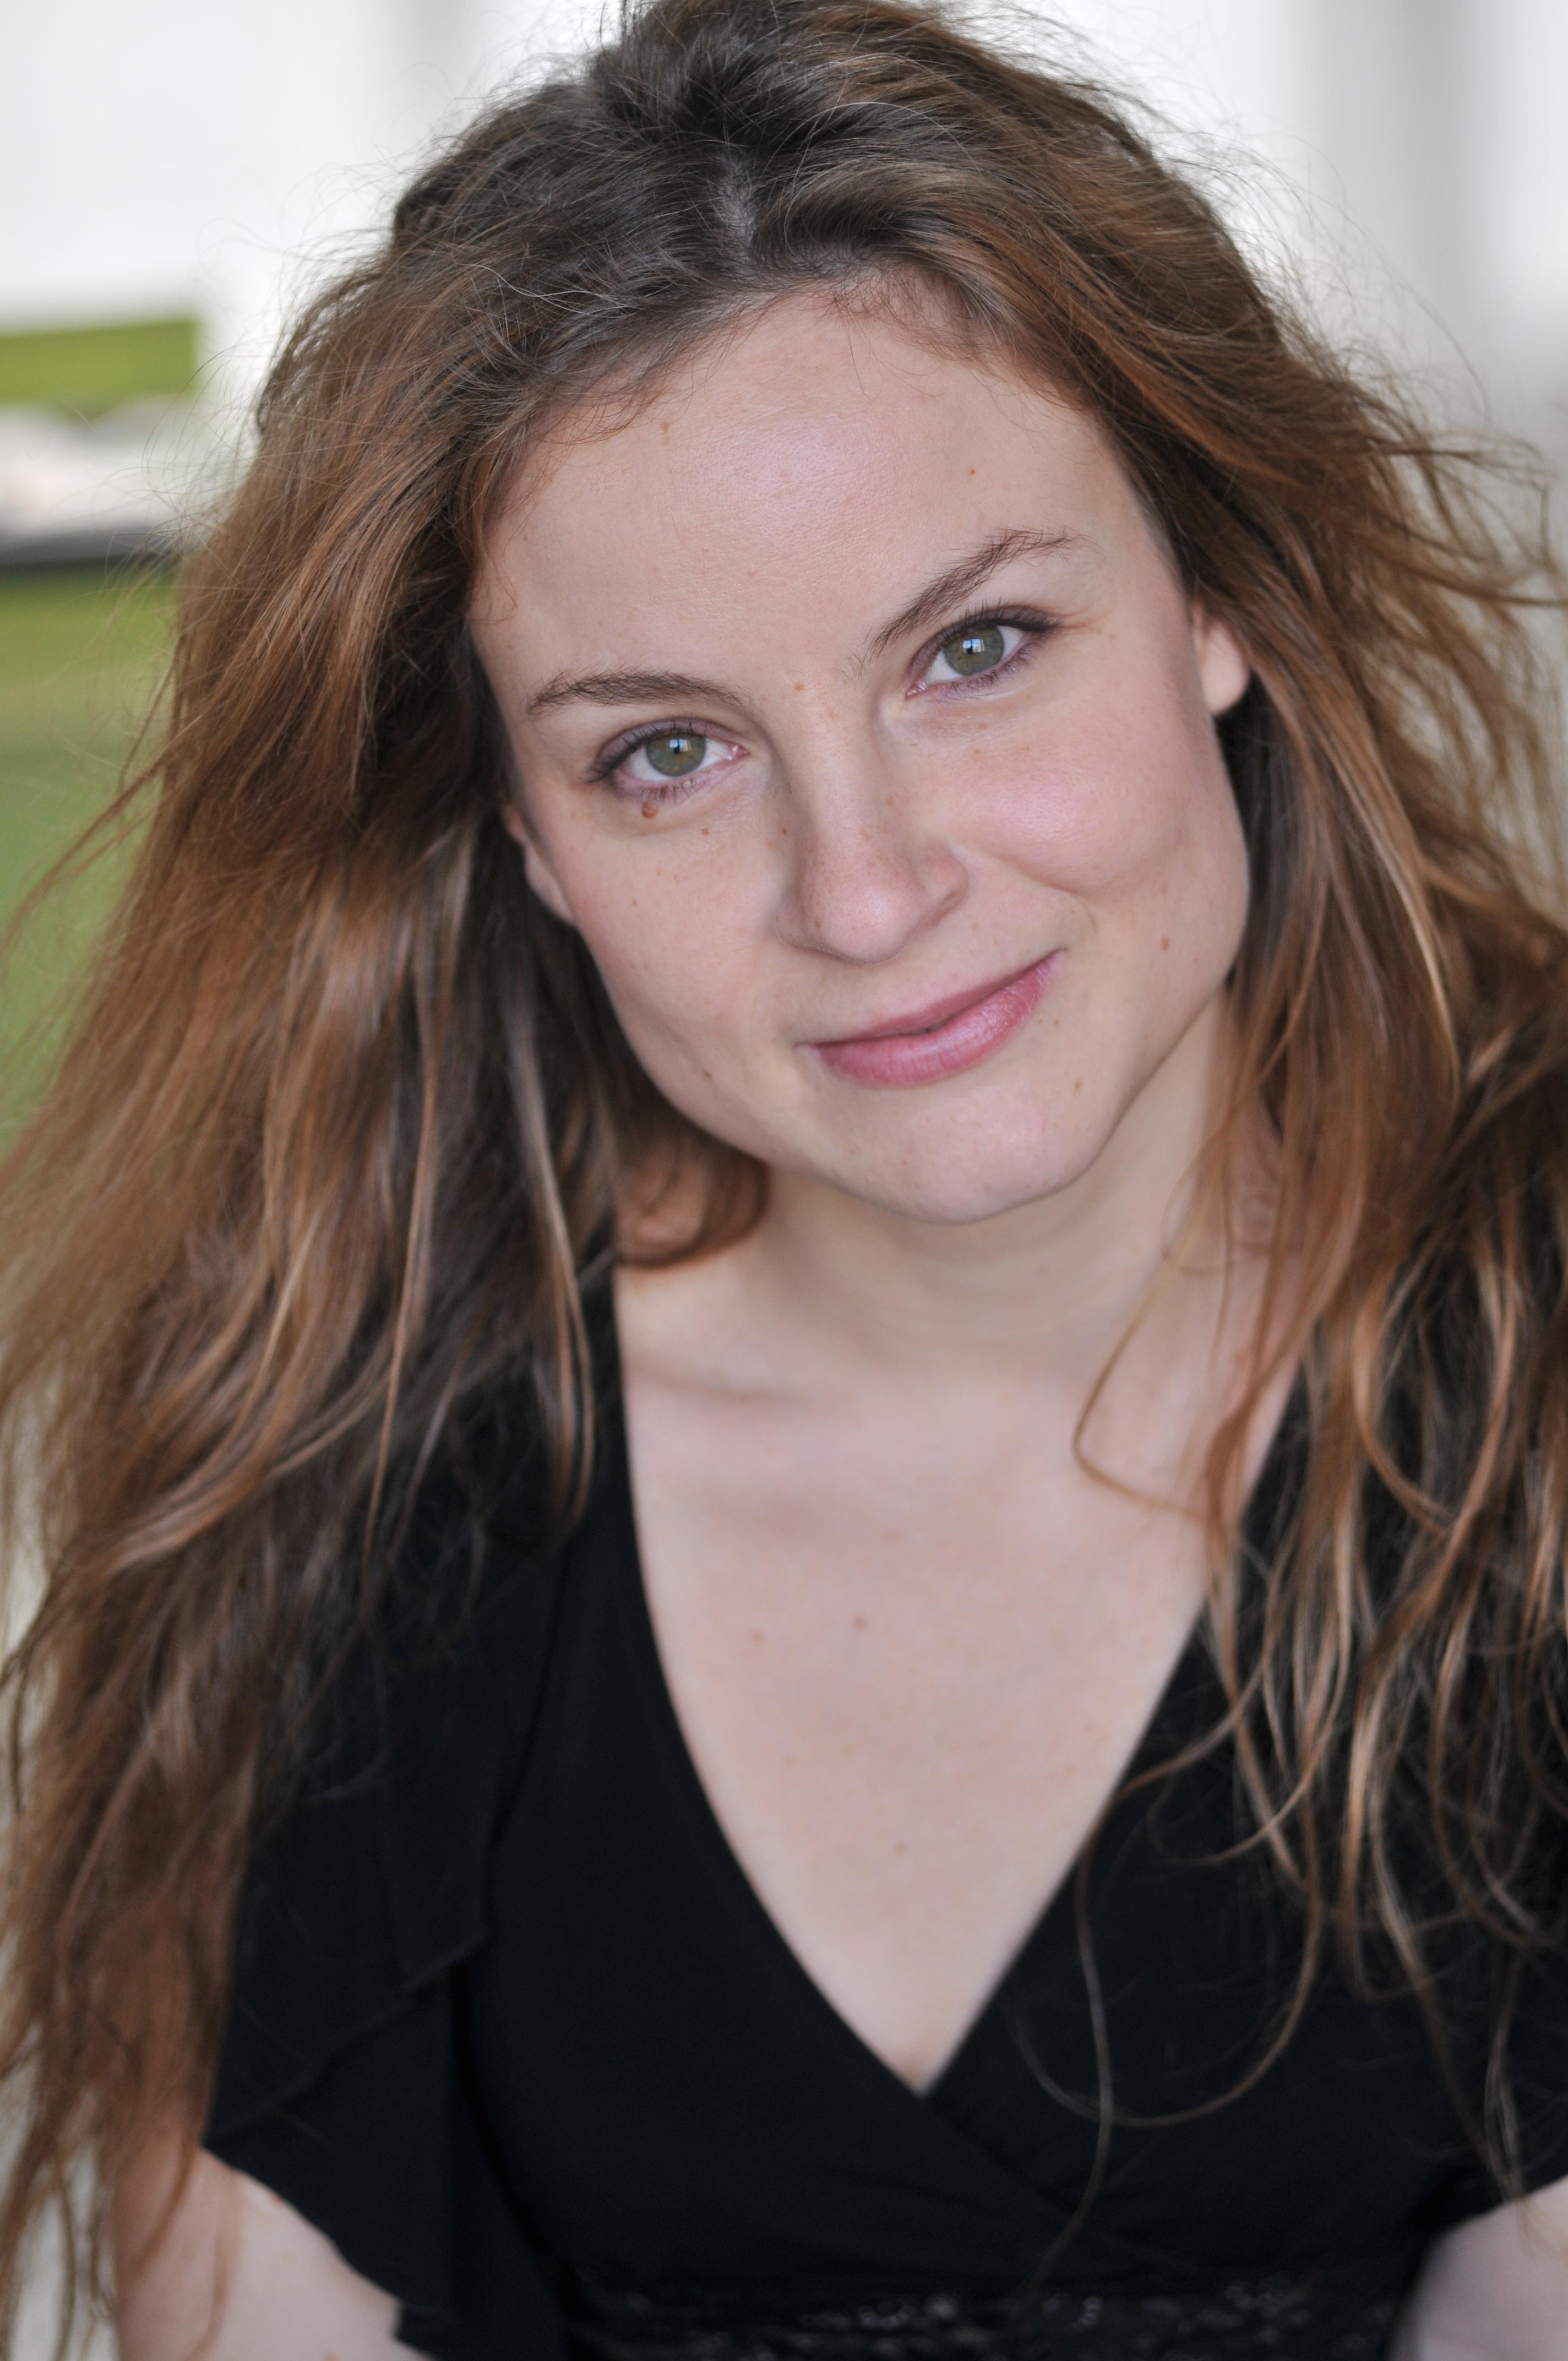 CharlotteMatzneff